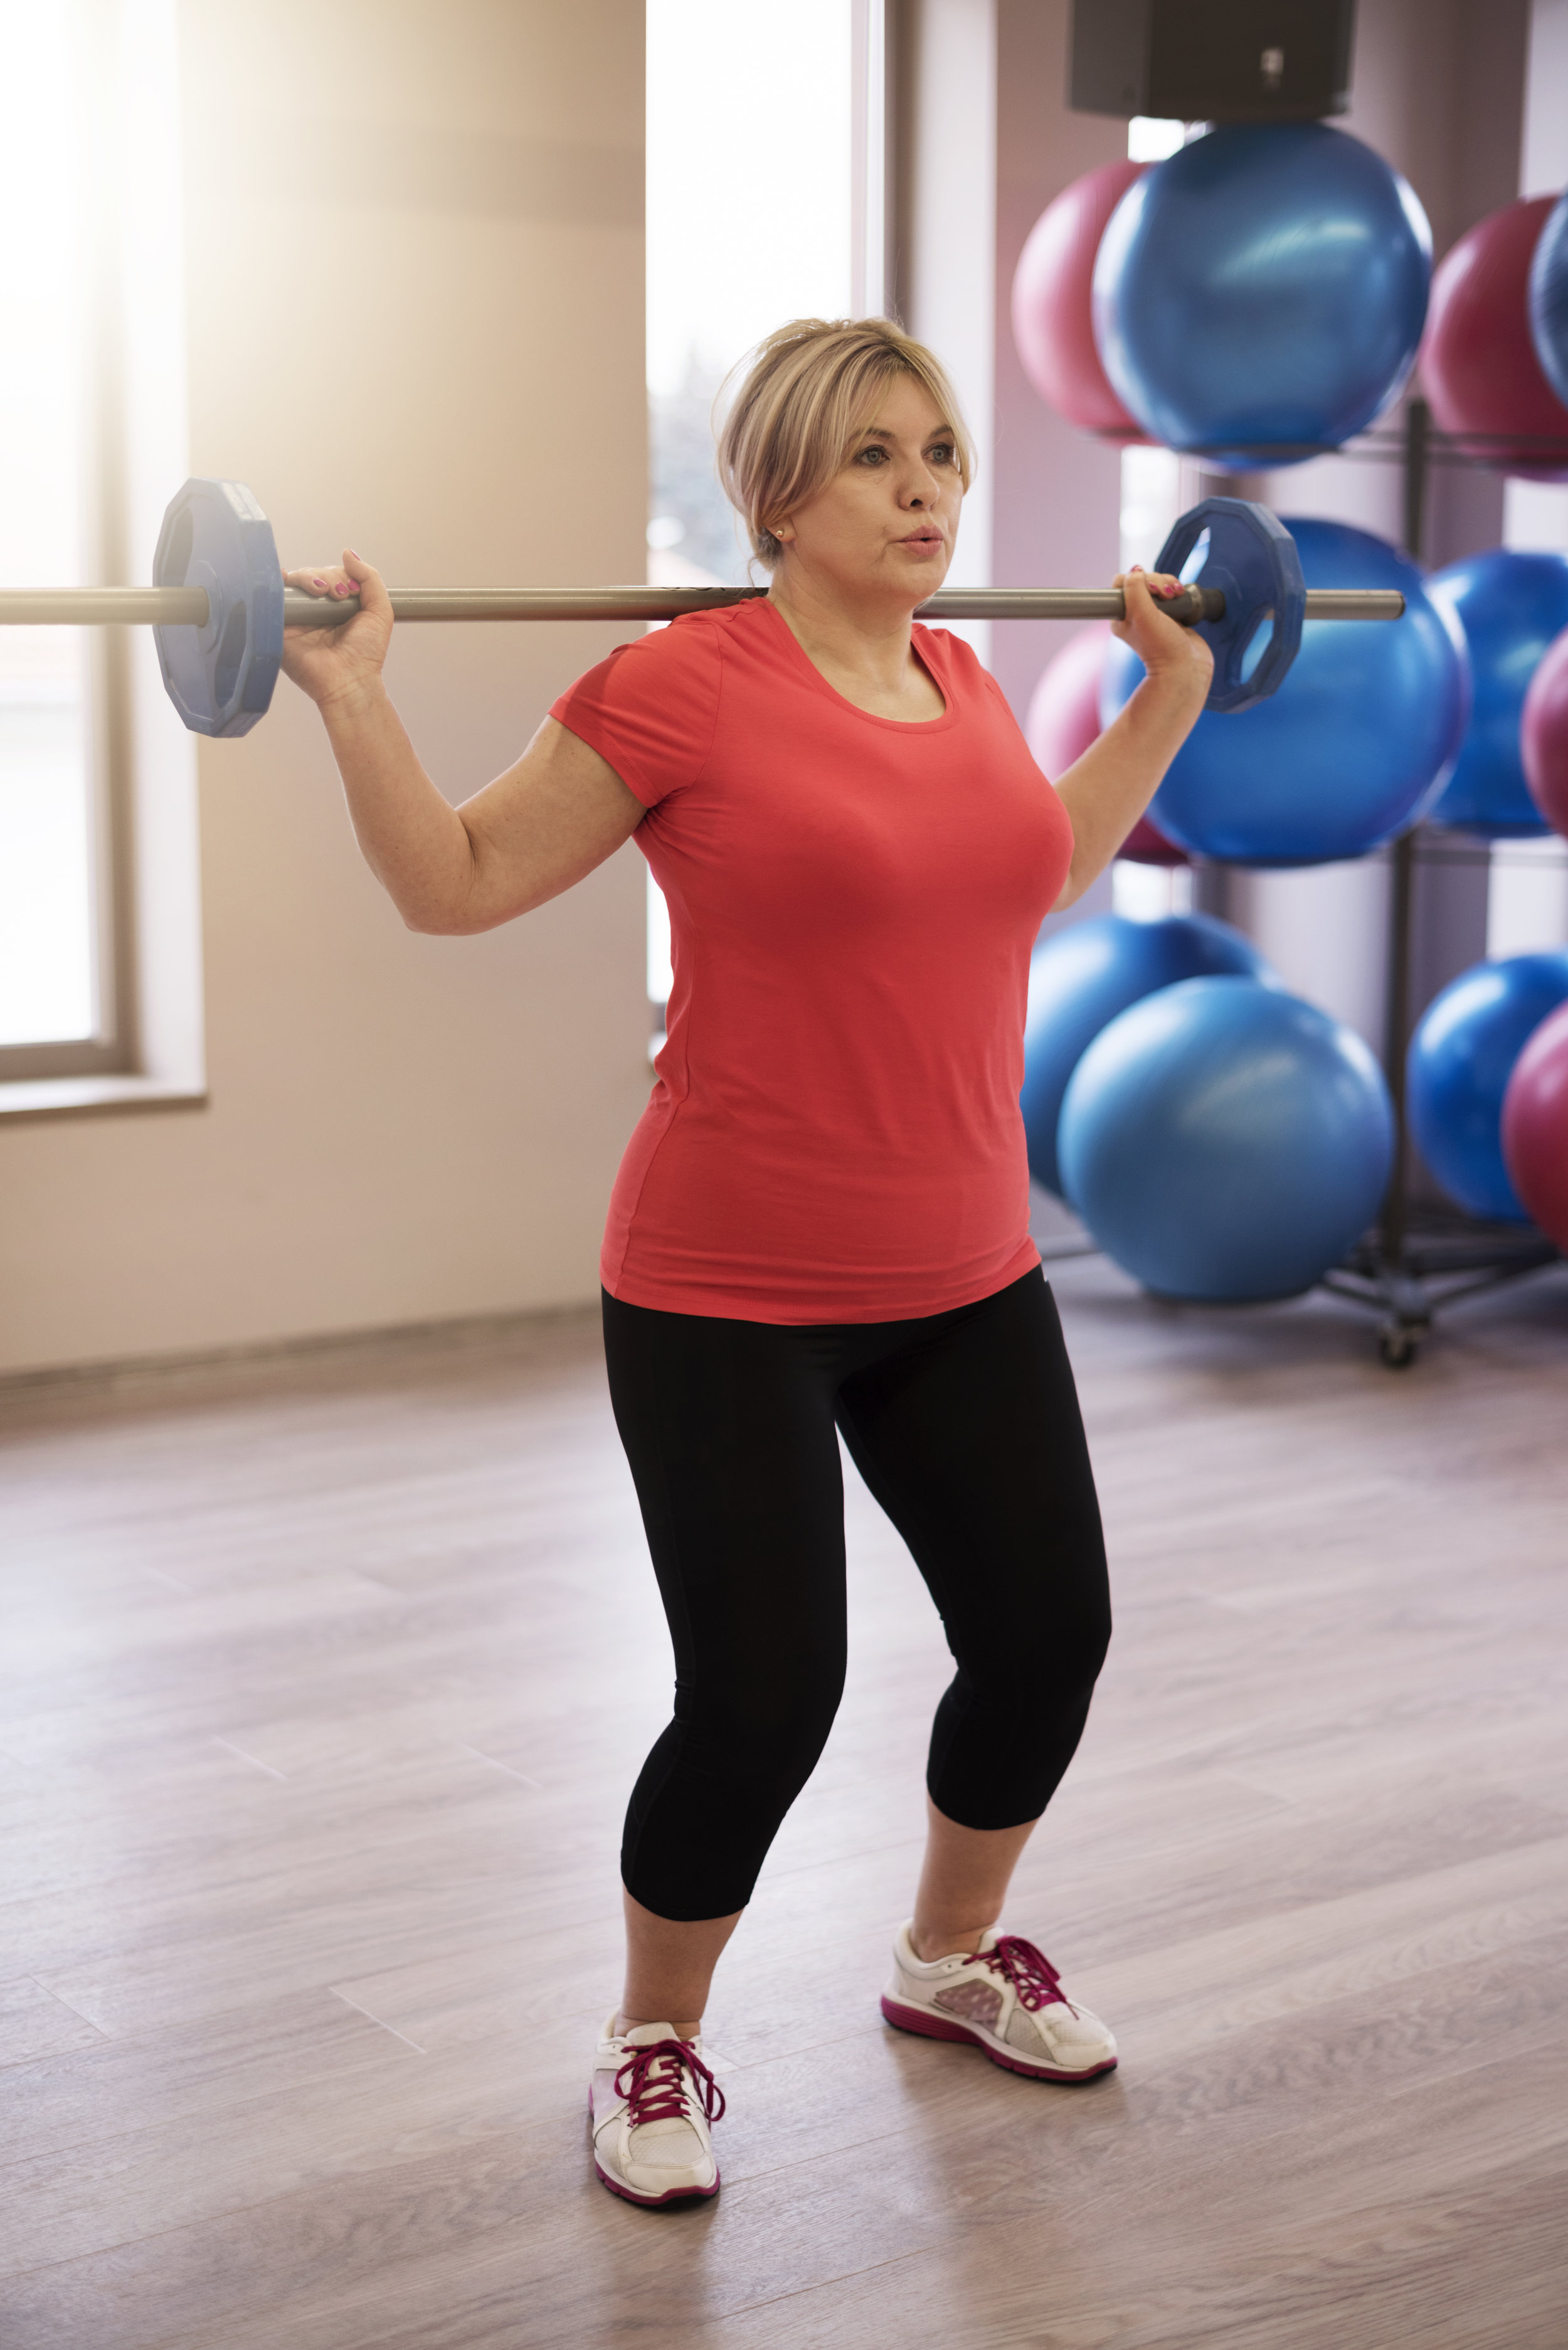 BWFS Image Older Woman Strength Training.jpg